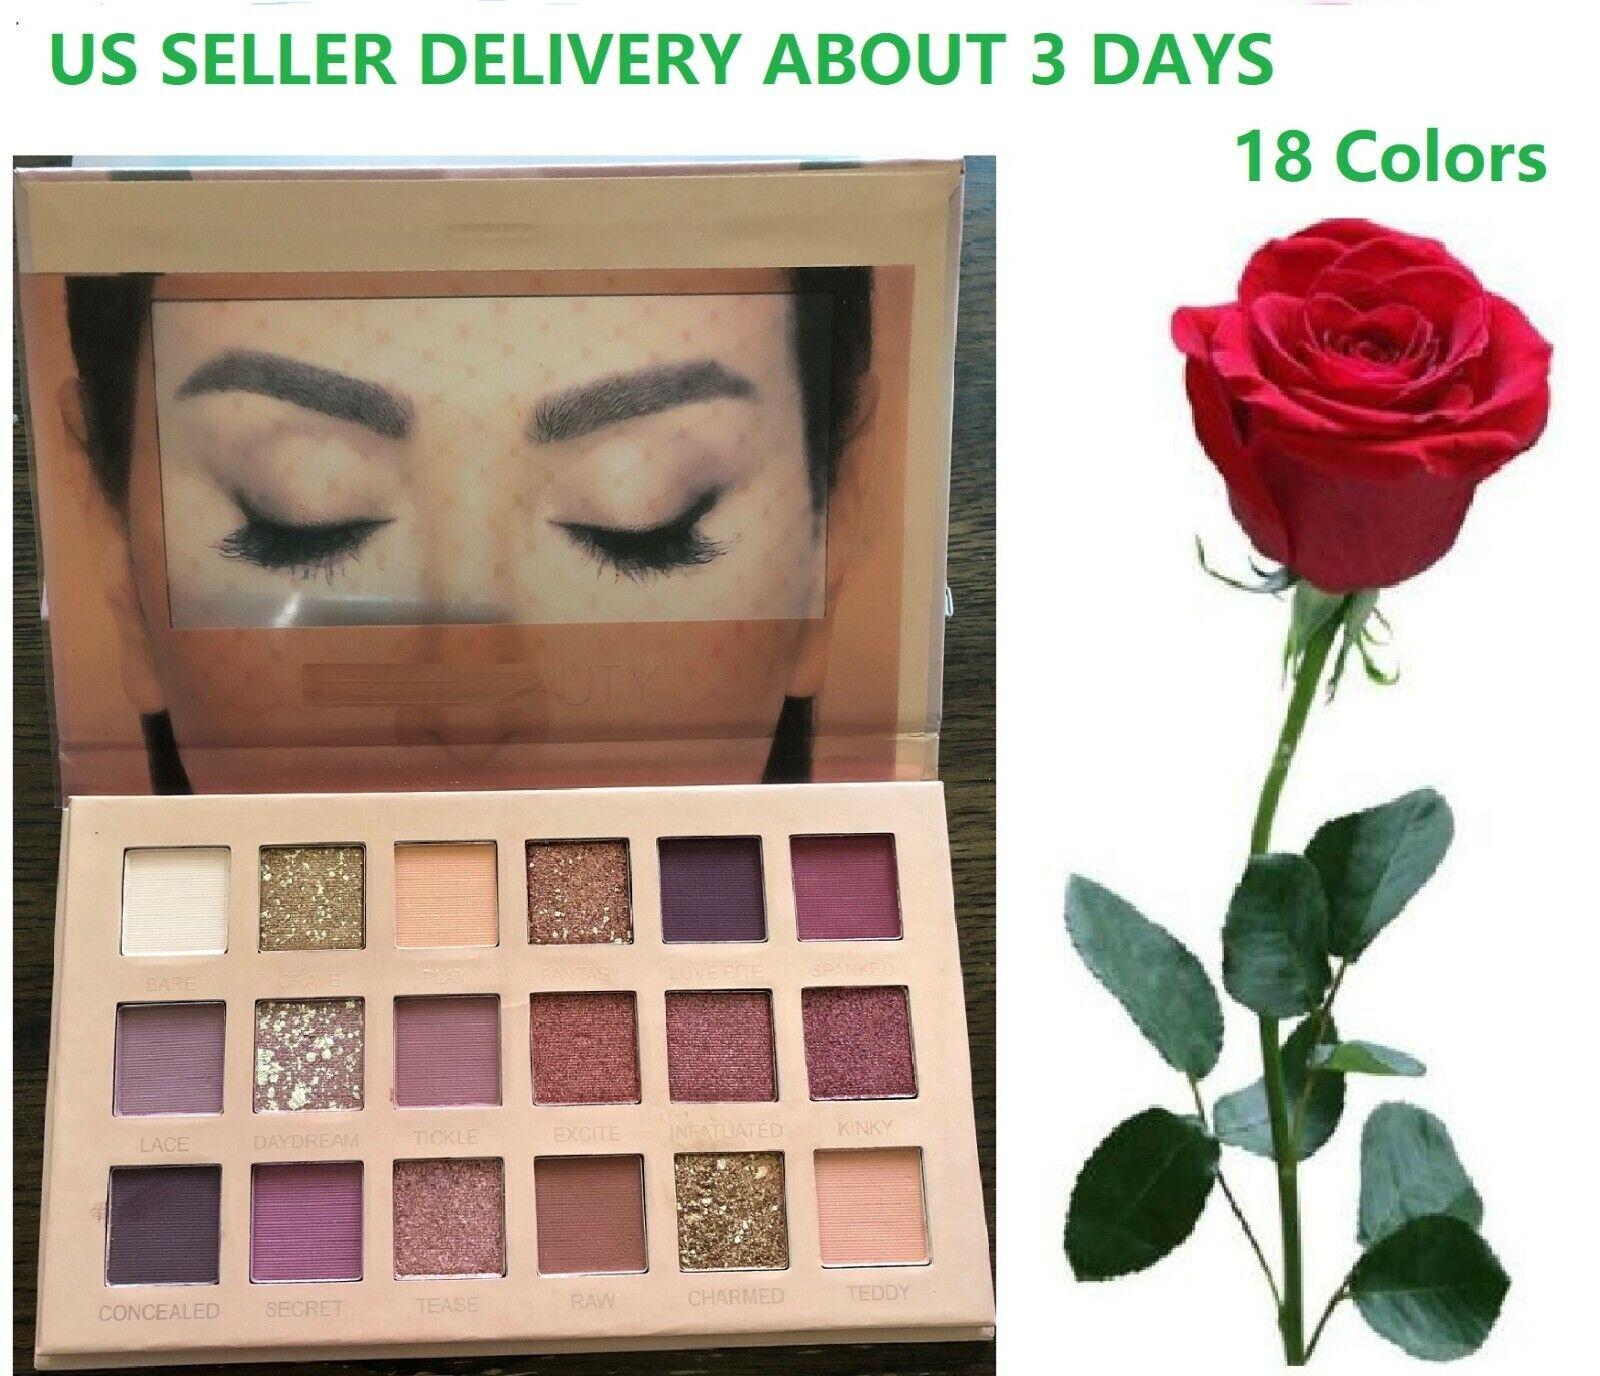 18 Colors Shimmer Matte Pigment Eyeshadow Palette Glitter Ey